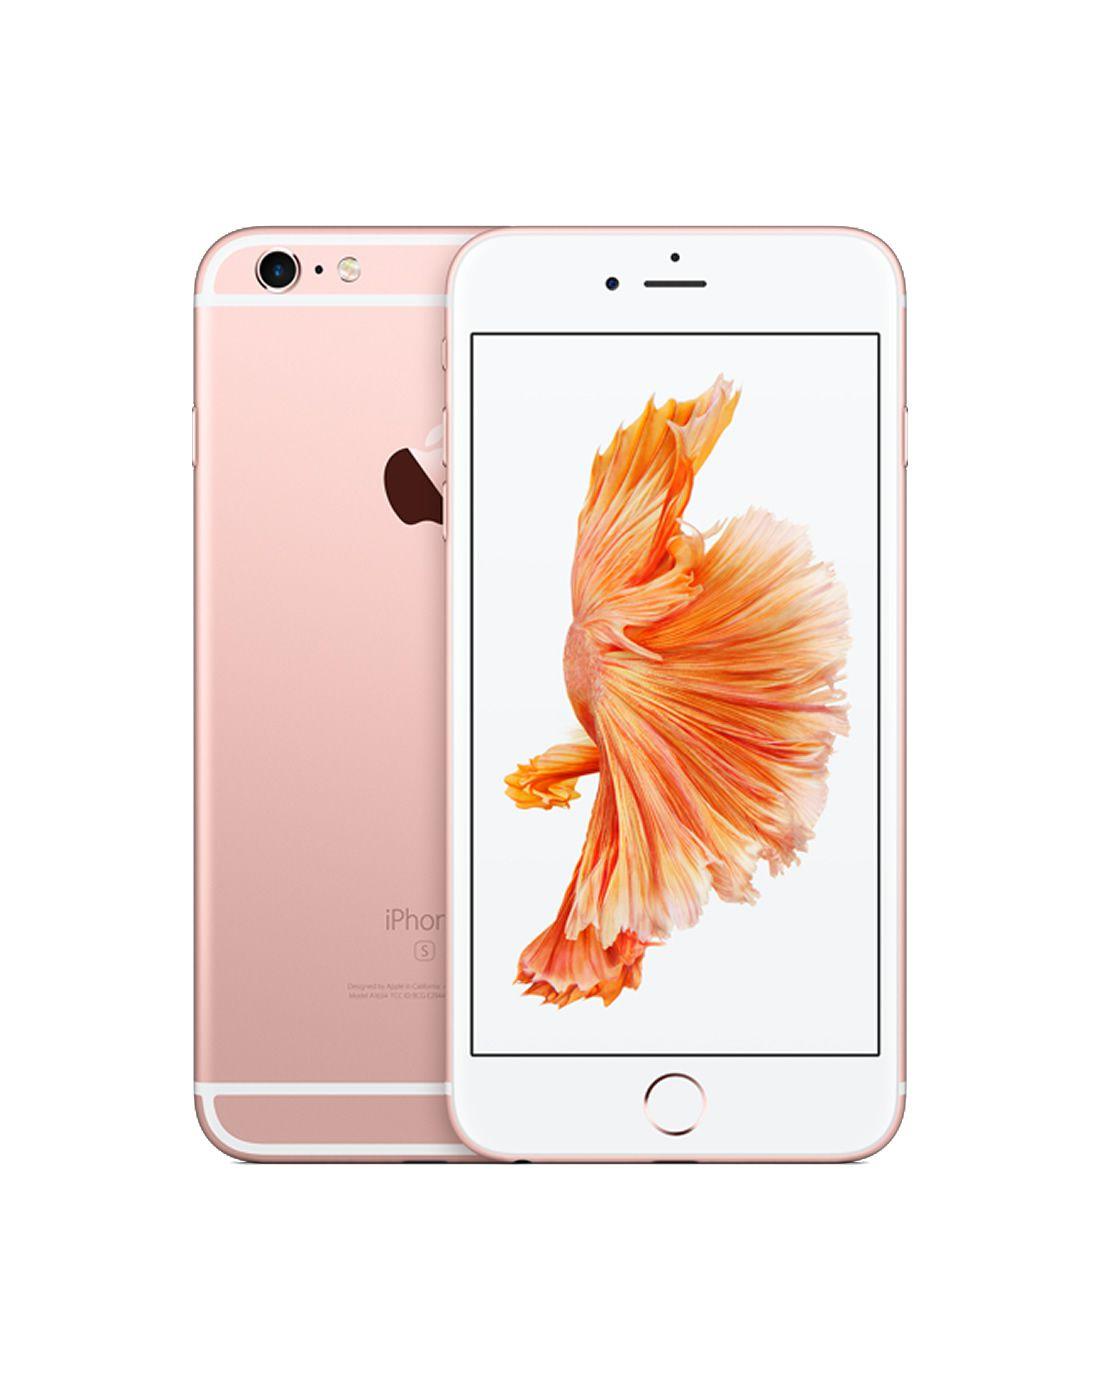 Apple iPhone 6s 64G 移动联通电信 全网通 玫瑰金色 ¥4480史低